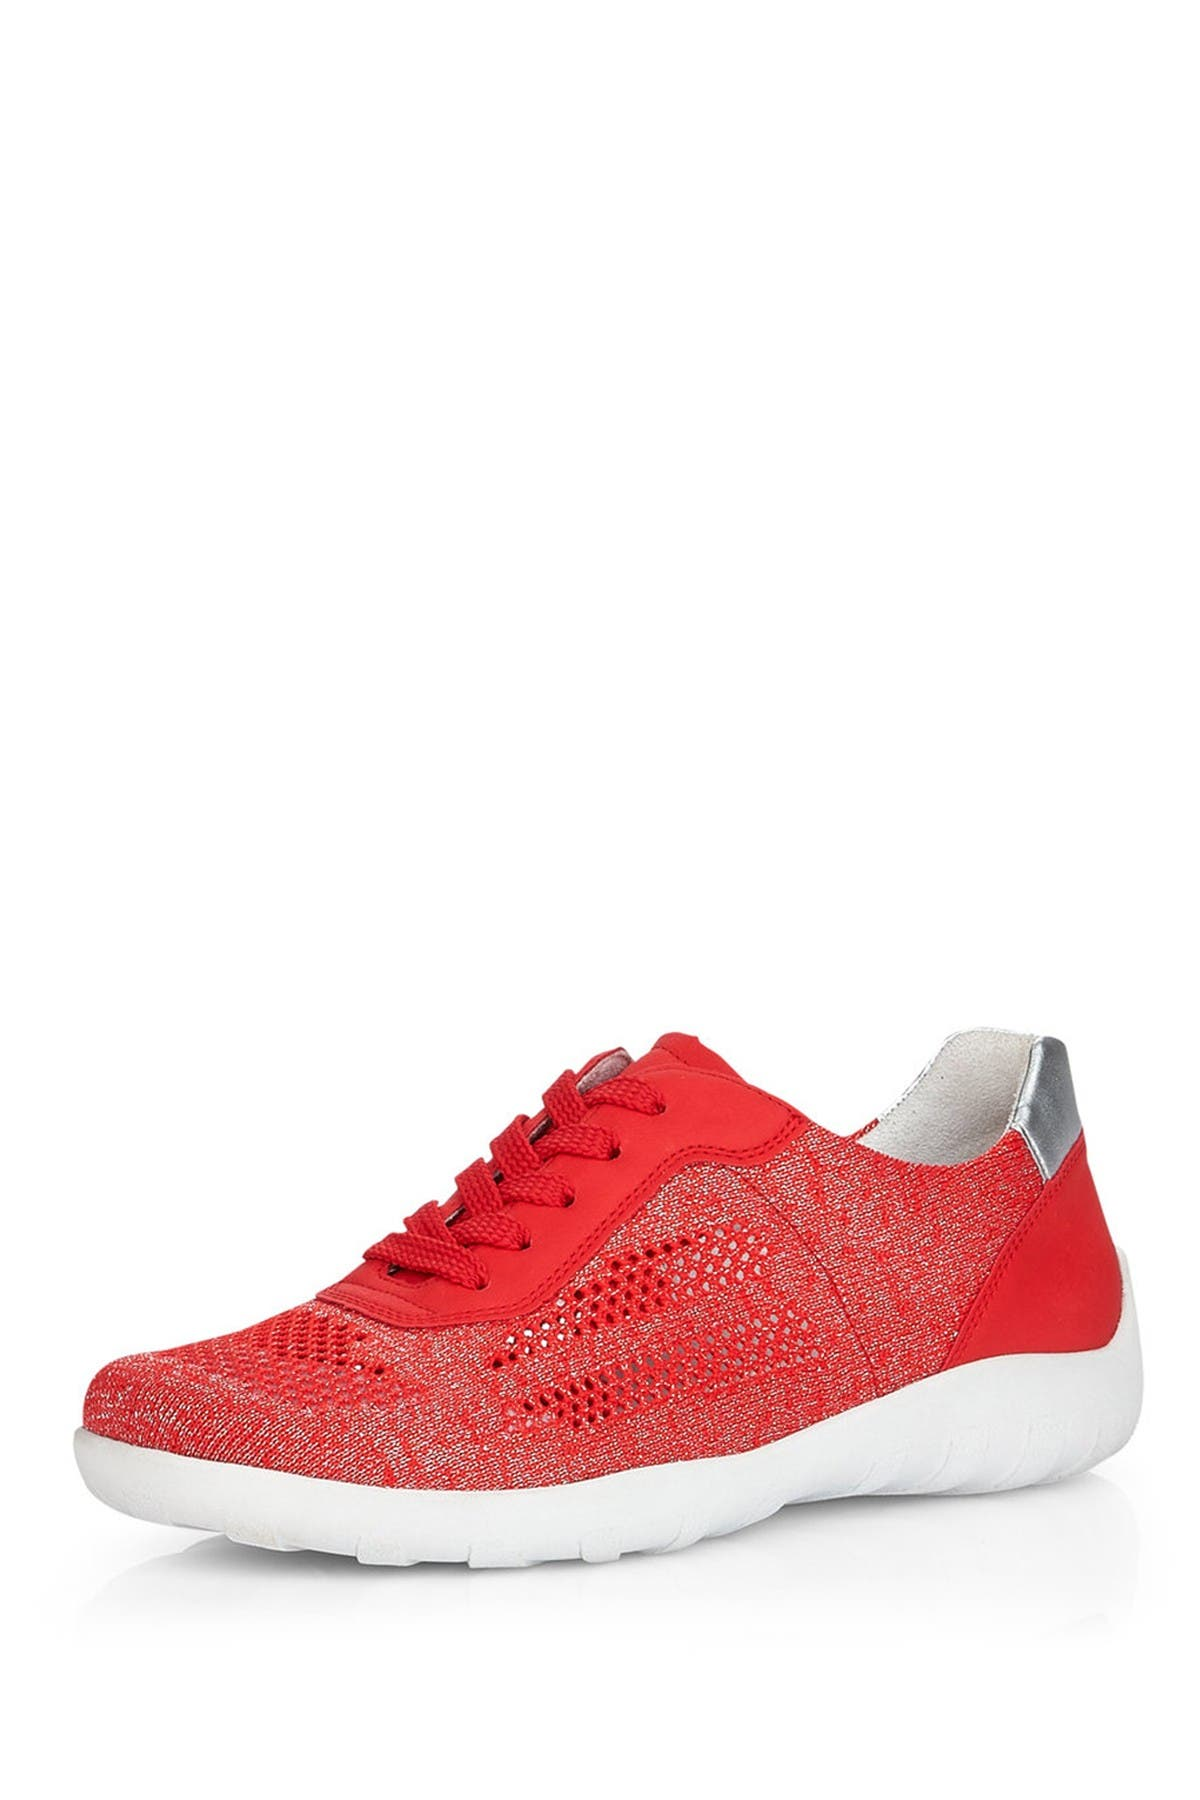 Image of Remonte Liv Sneaker